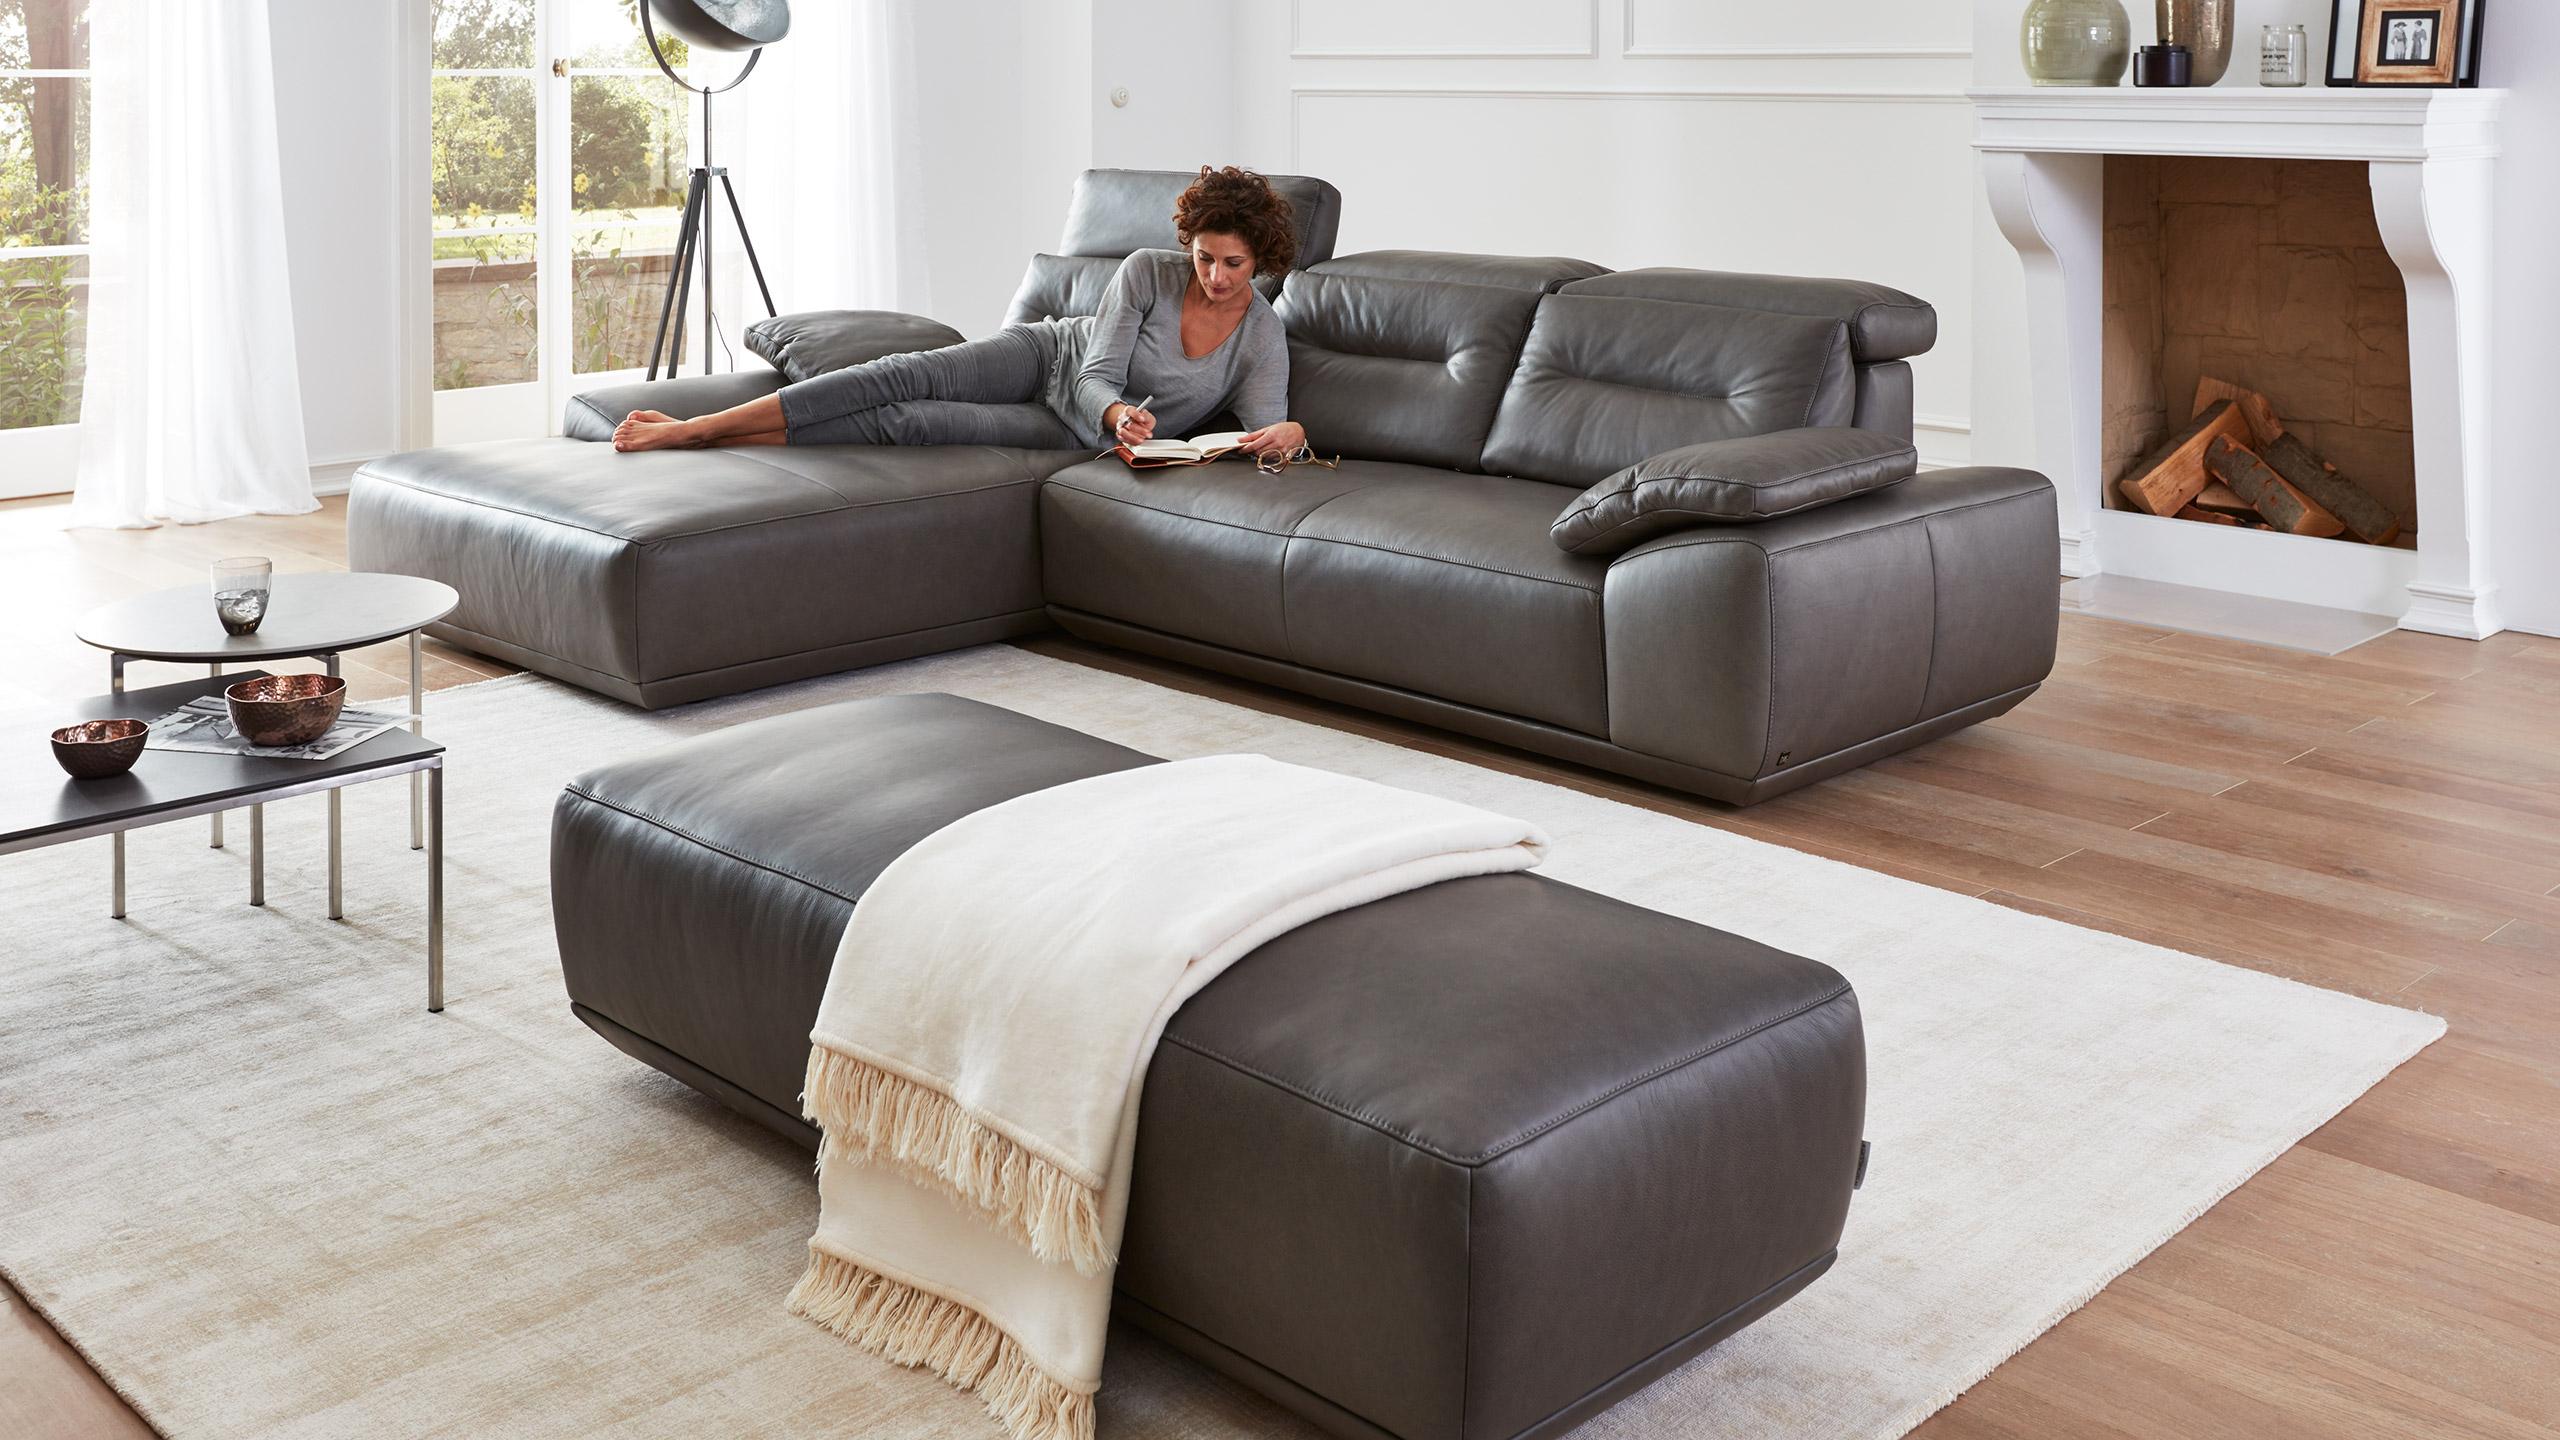 Interliving-Sofa-Serie-4000-Leseplaetzchen-lesen-Sitzhocker-Lieblingsplatz_Leder